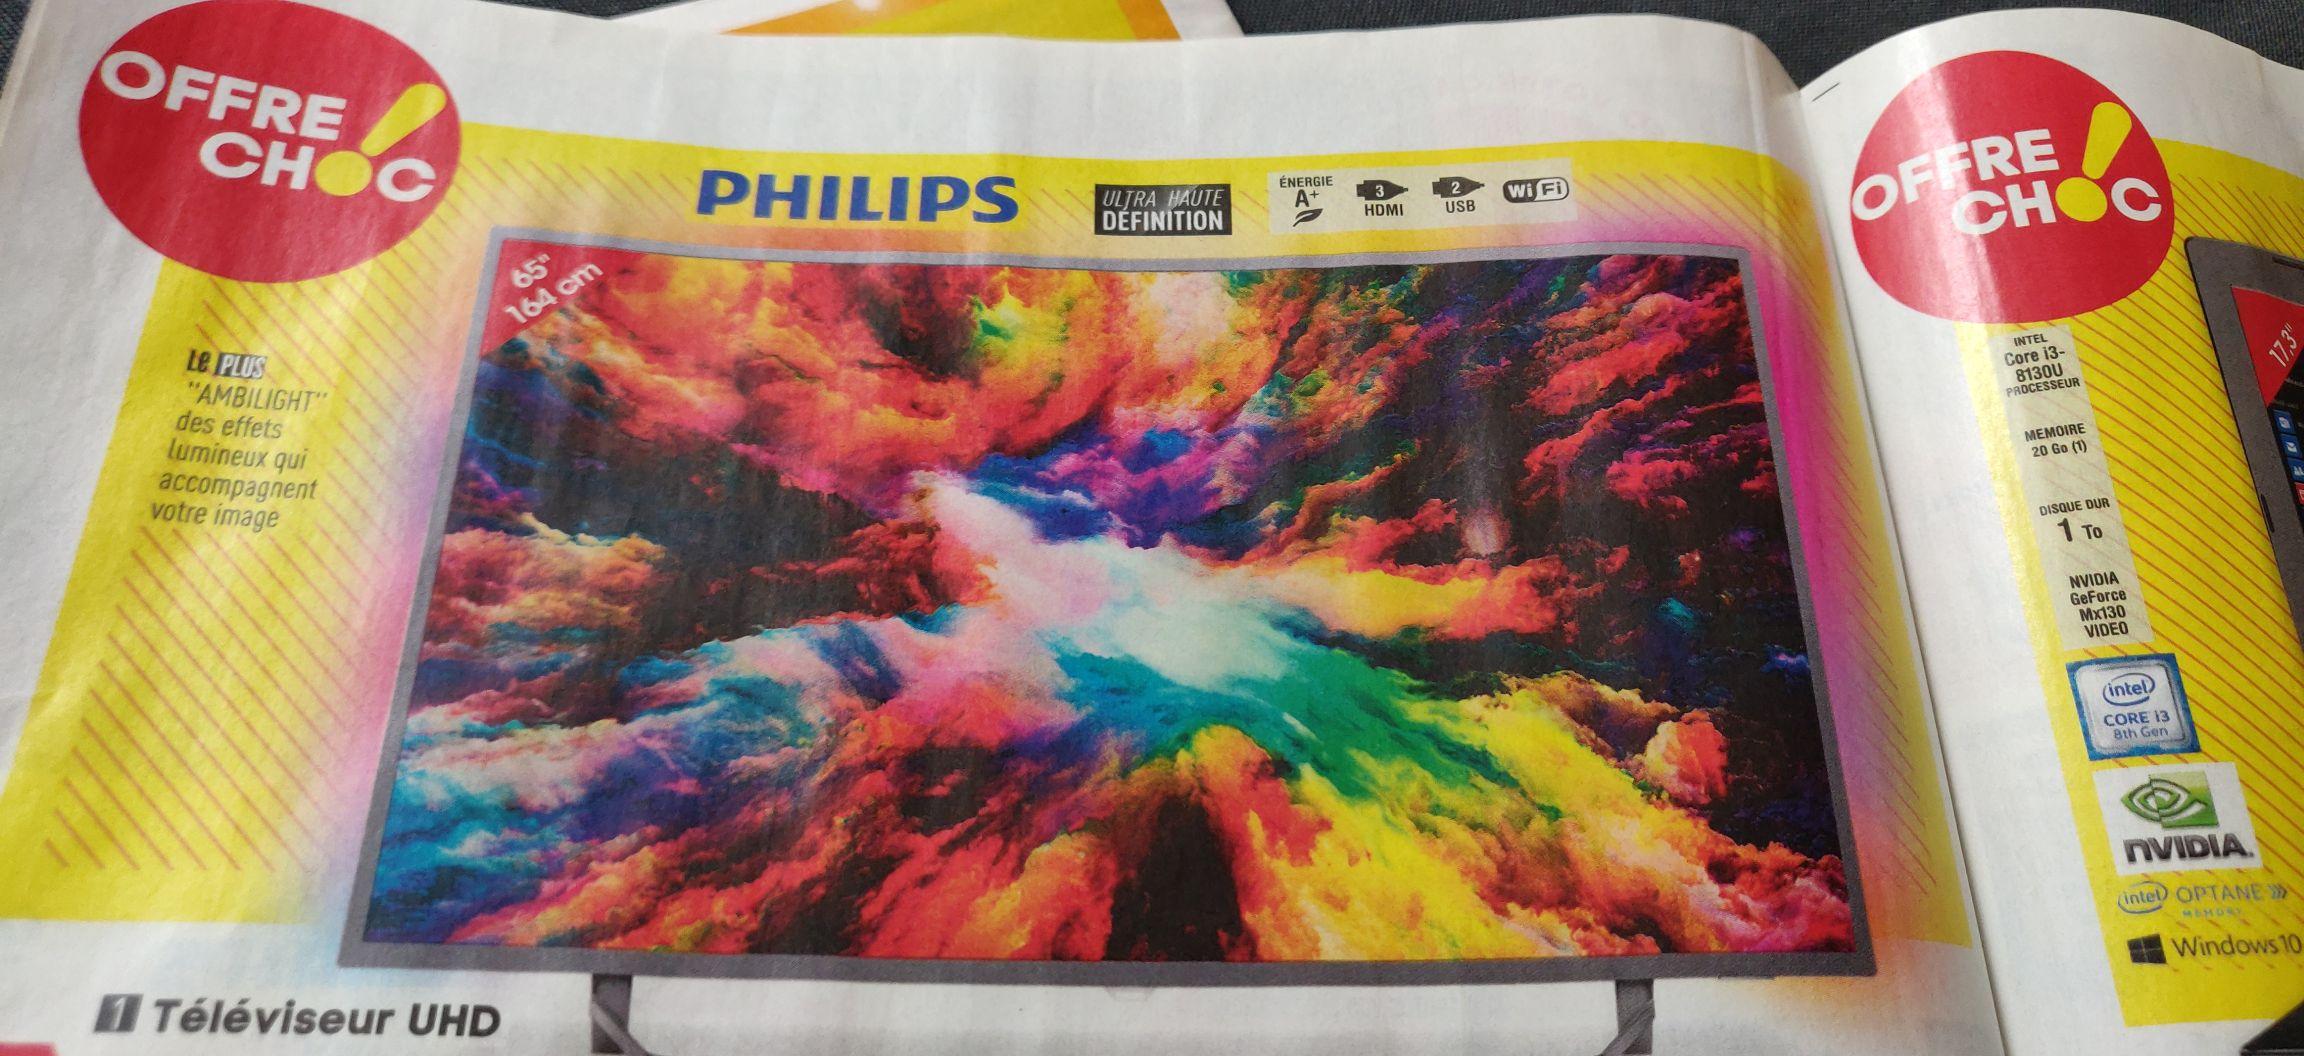 "TV 65"" Philips 65PUS6753 - LED, 4K UHD, Ambilight 3 côtés"